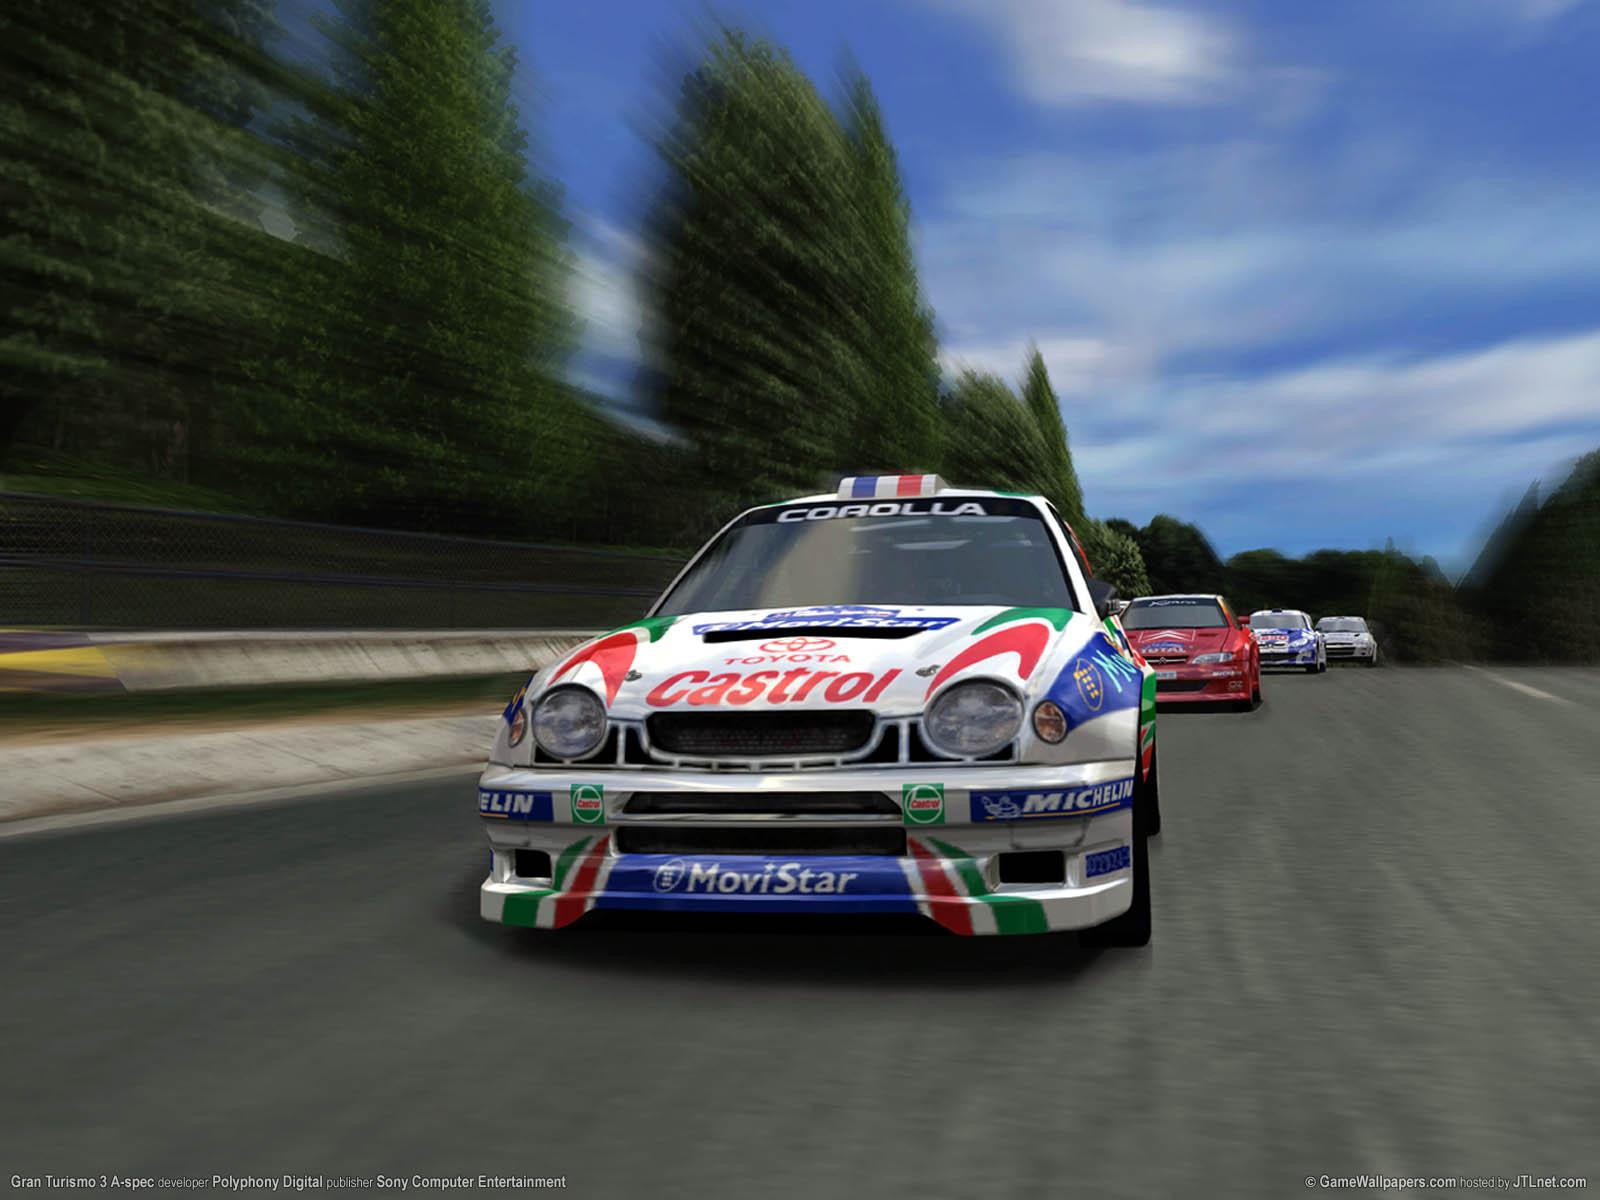 Gran Turismo 3 A-spec Hintergrundbild 06 1600x1200